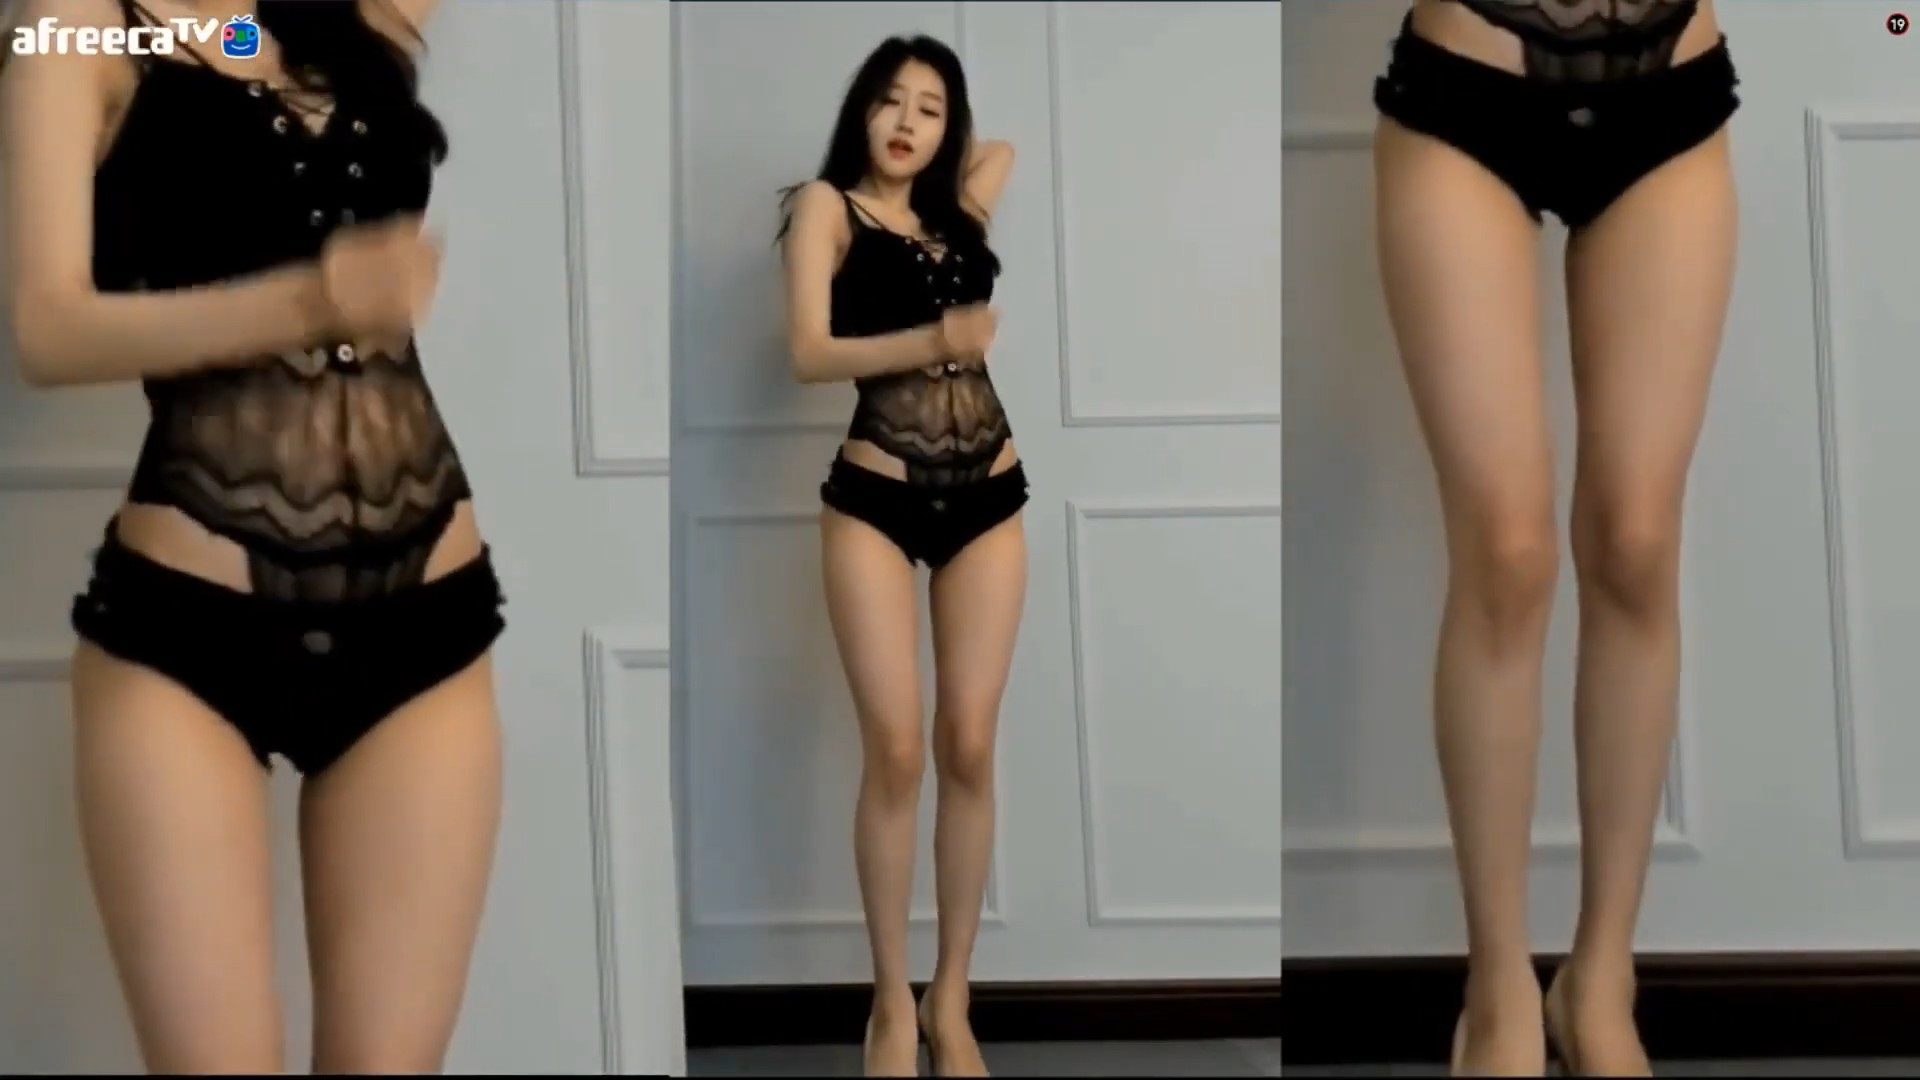 KOREA BJ SEOA 徐雅 蕾丝上衣黑超短裤[1080P]